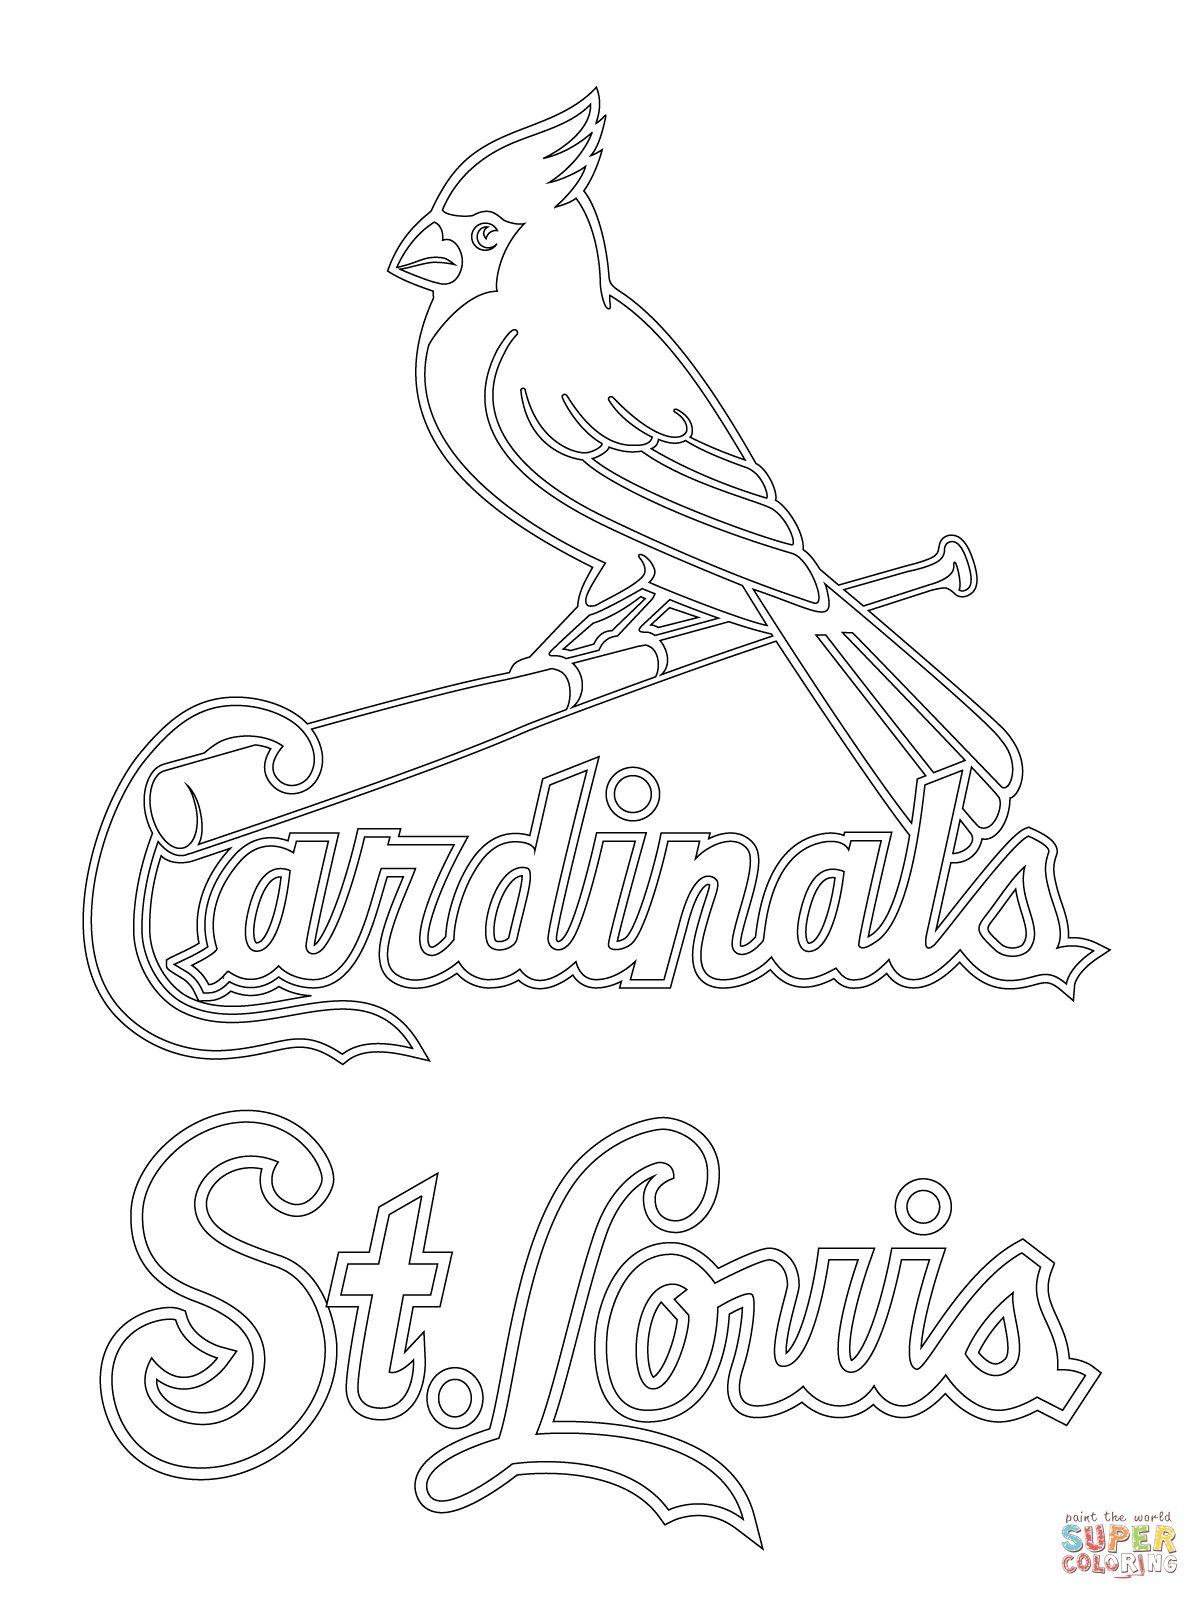 St Louis Cardinals Logo Coloring Page | Supercoloringcom